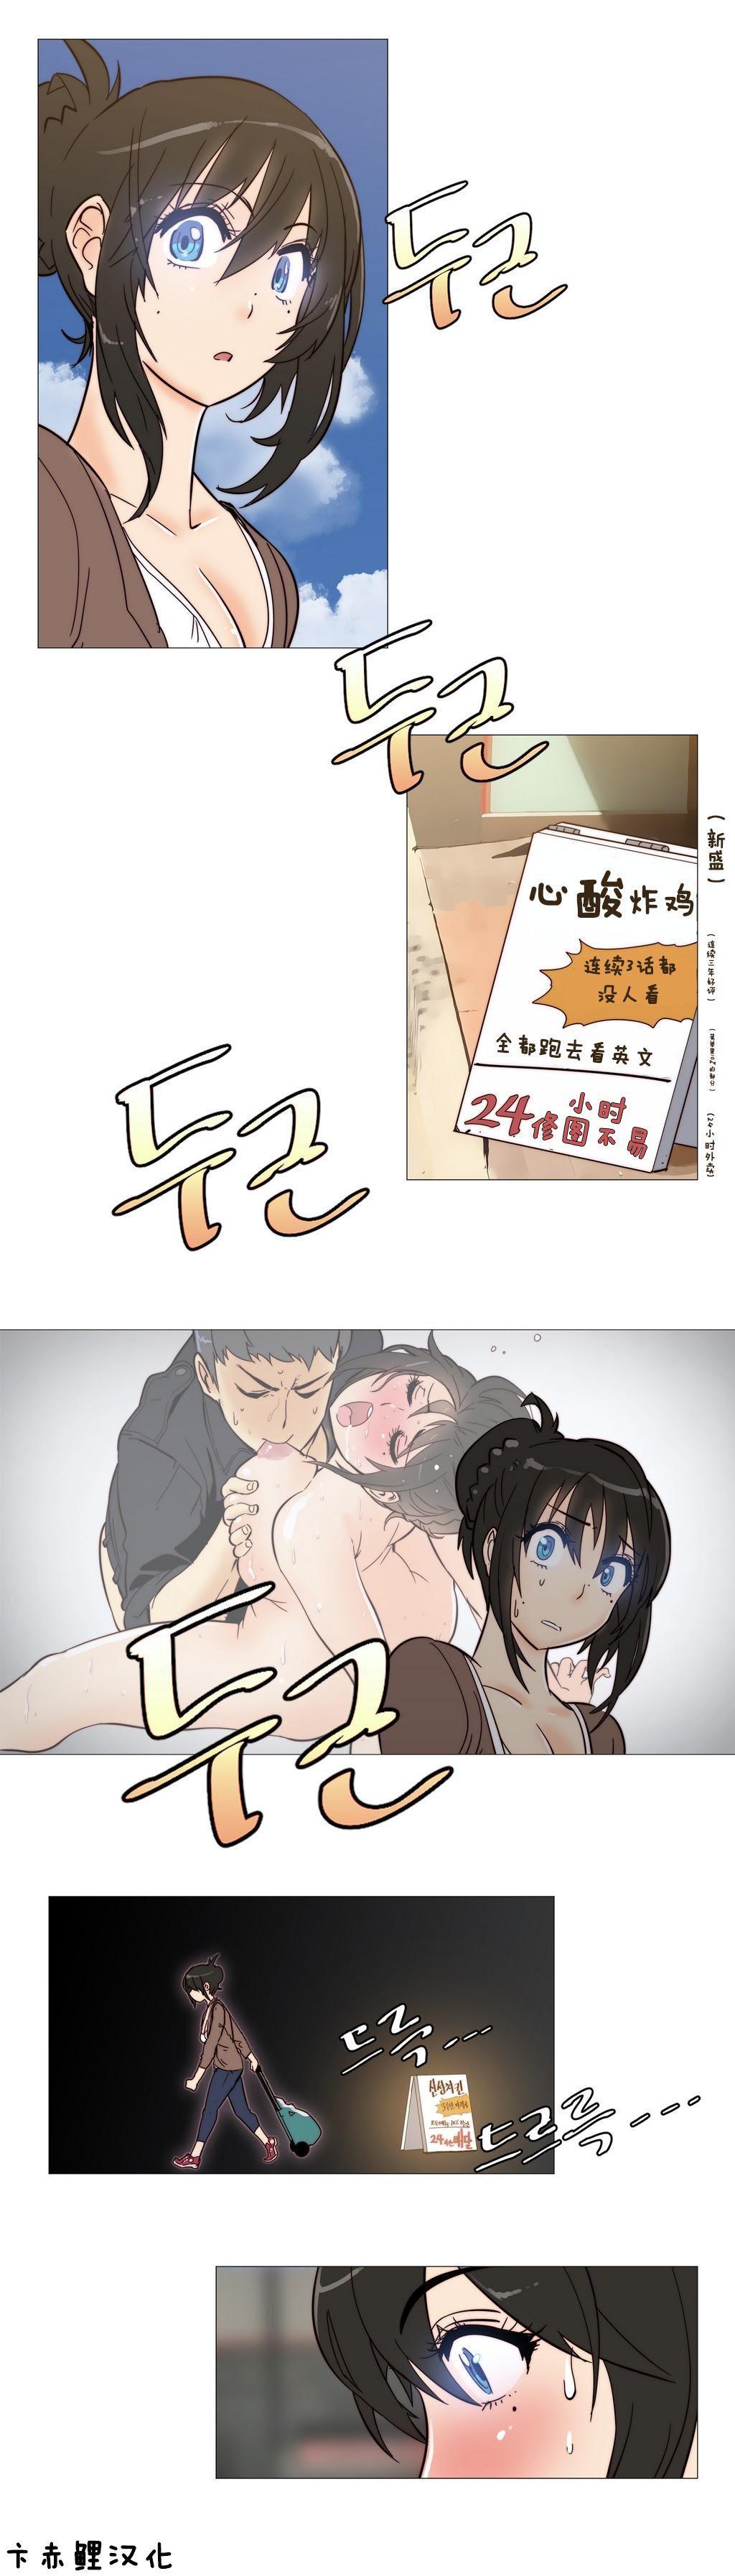 HouseHold Affairs 【卞赤鲤个人汉化】1~21话(持续更新中) 62